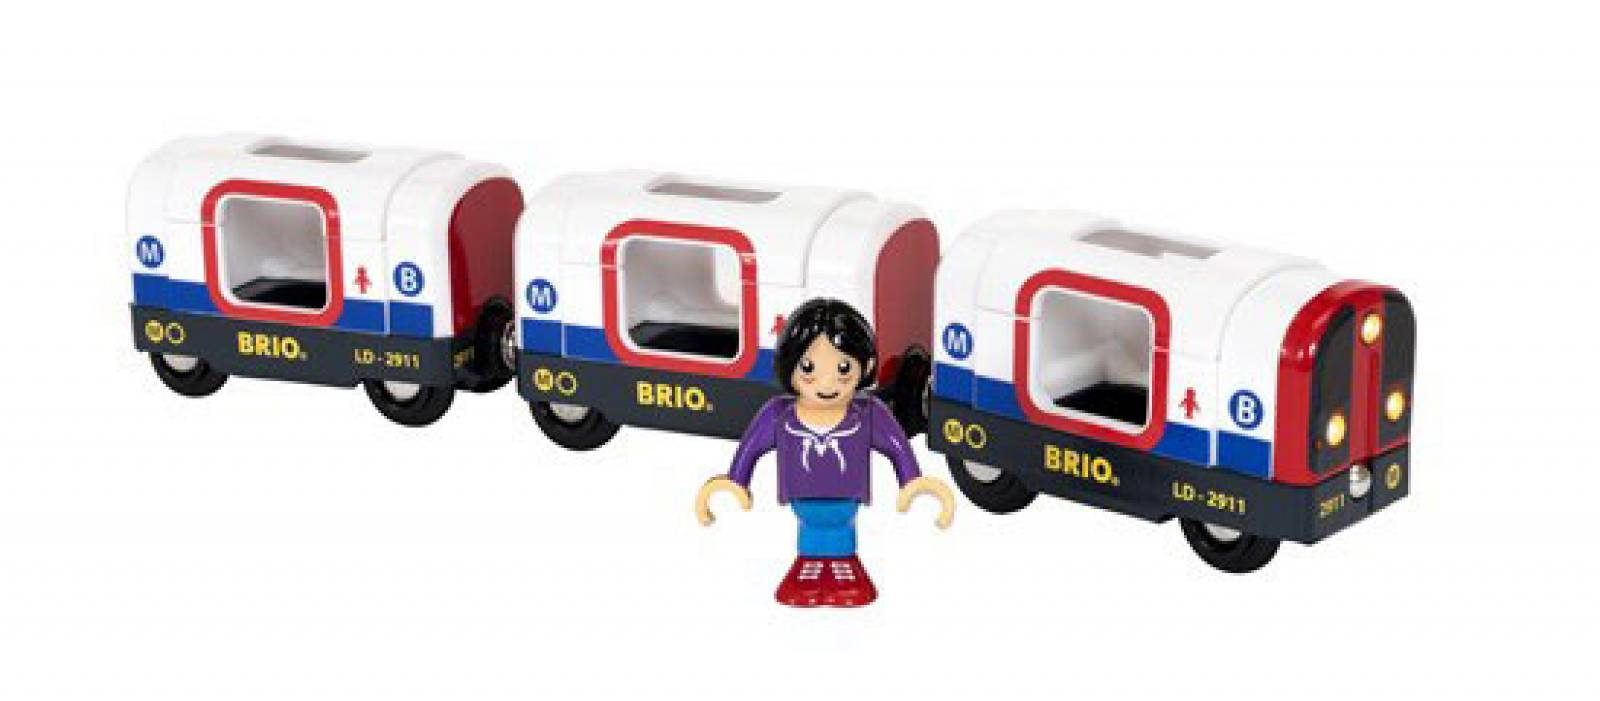 Metro Train BRIO Wooden Railway Age 3+